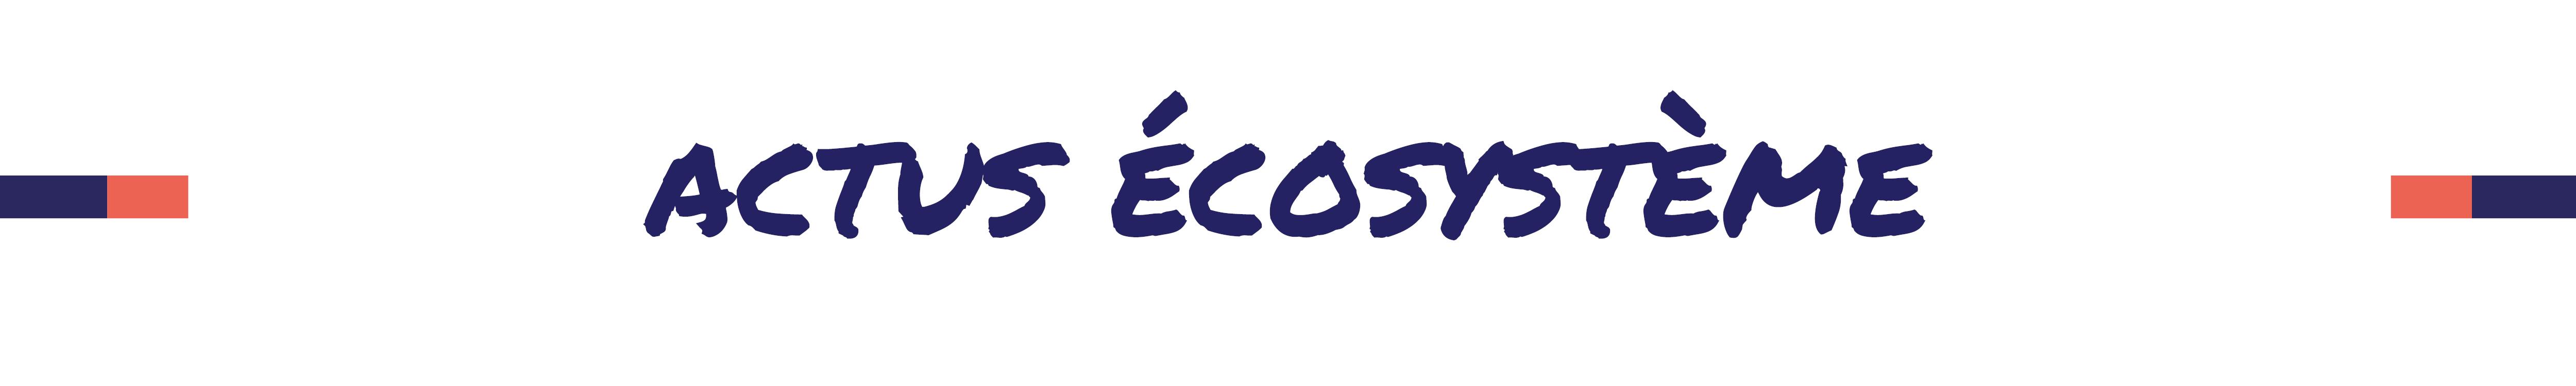 actus ecosysteme.png